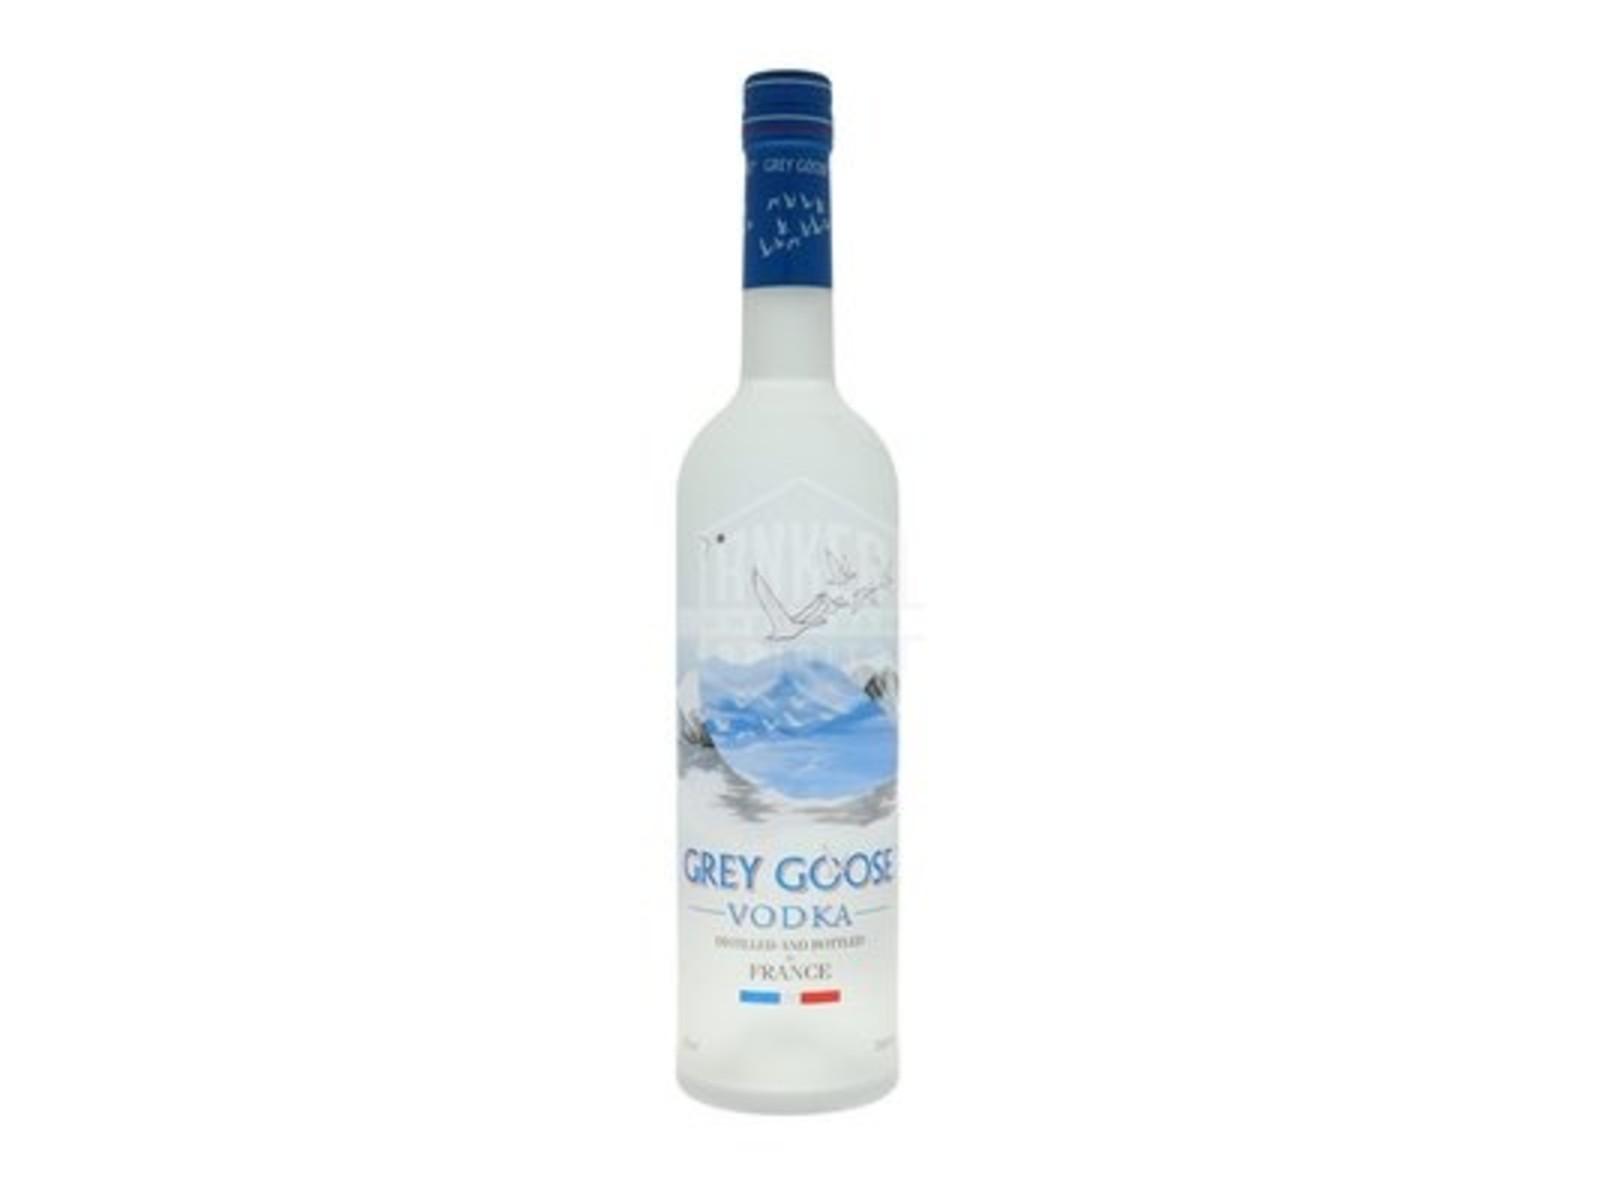 Grey Goose Grey Goose / vodka / 0,7L